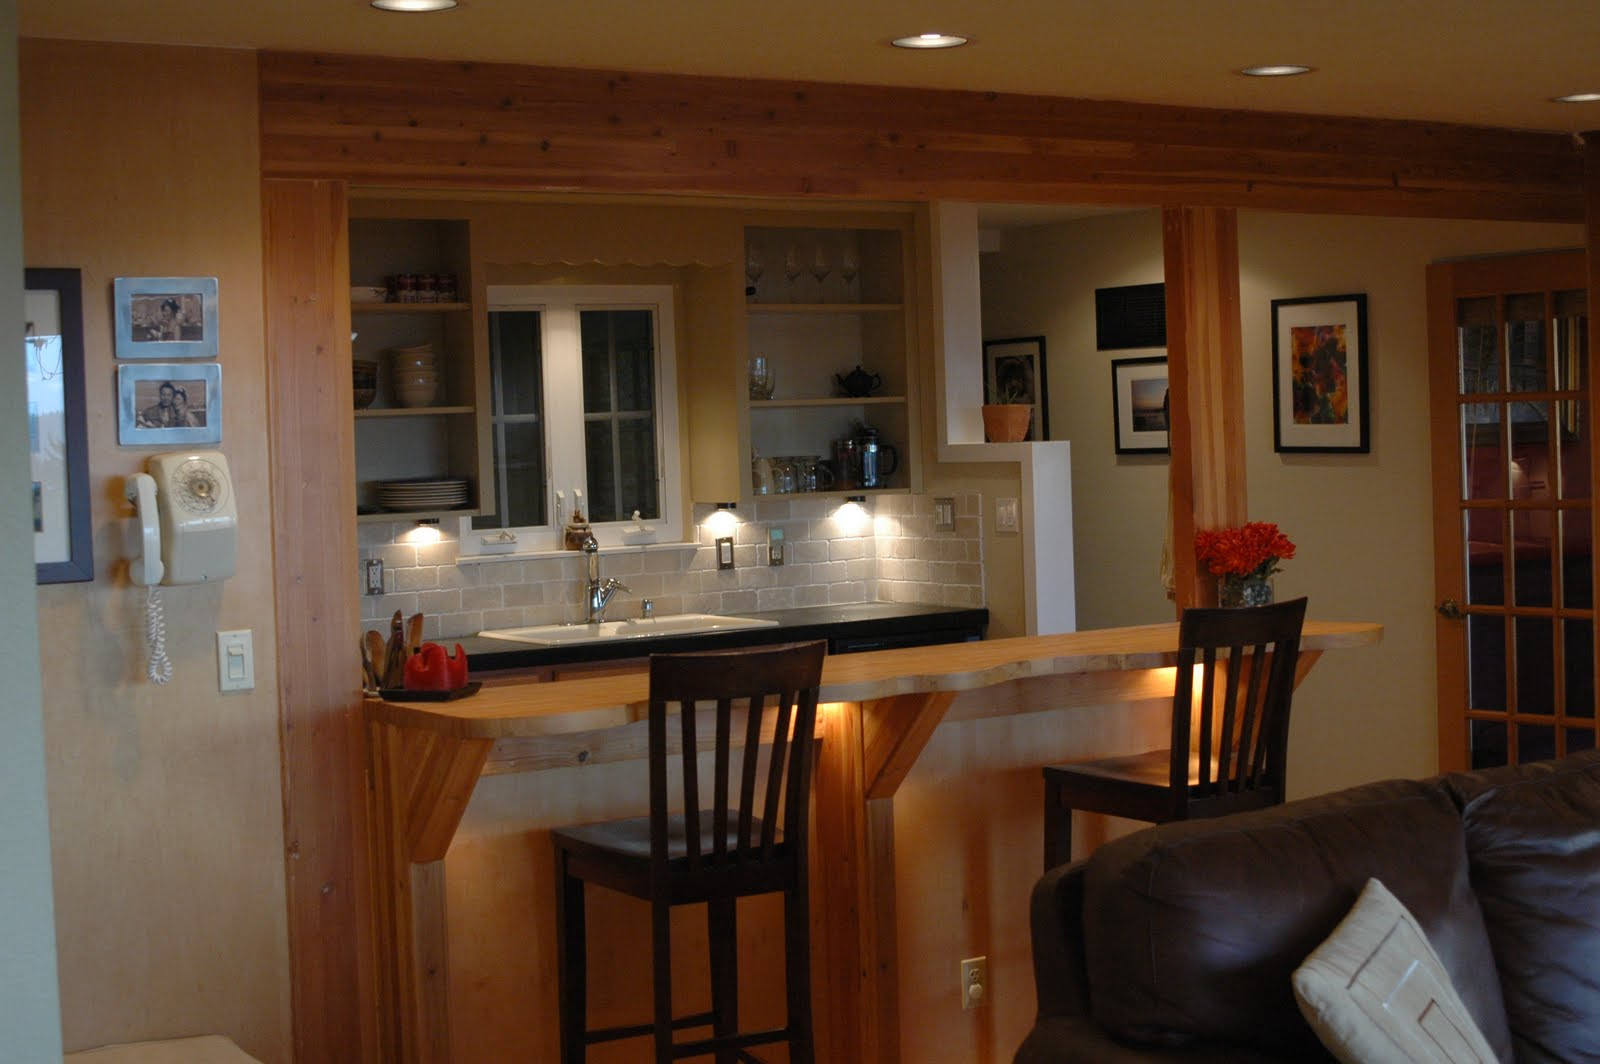 Kitchenaid Countertop Appliances